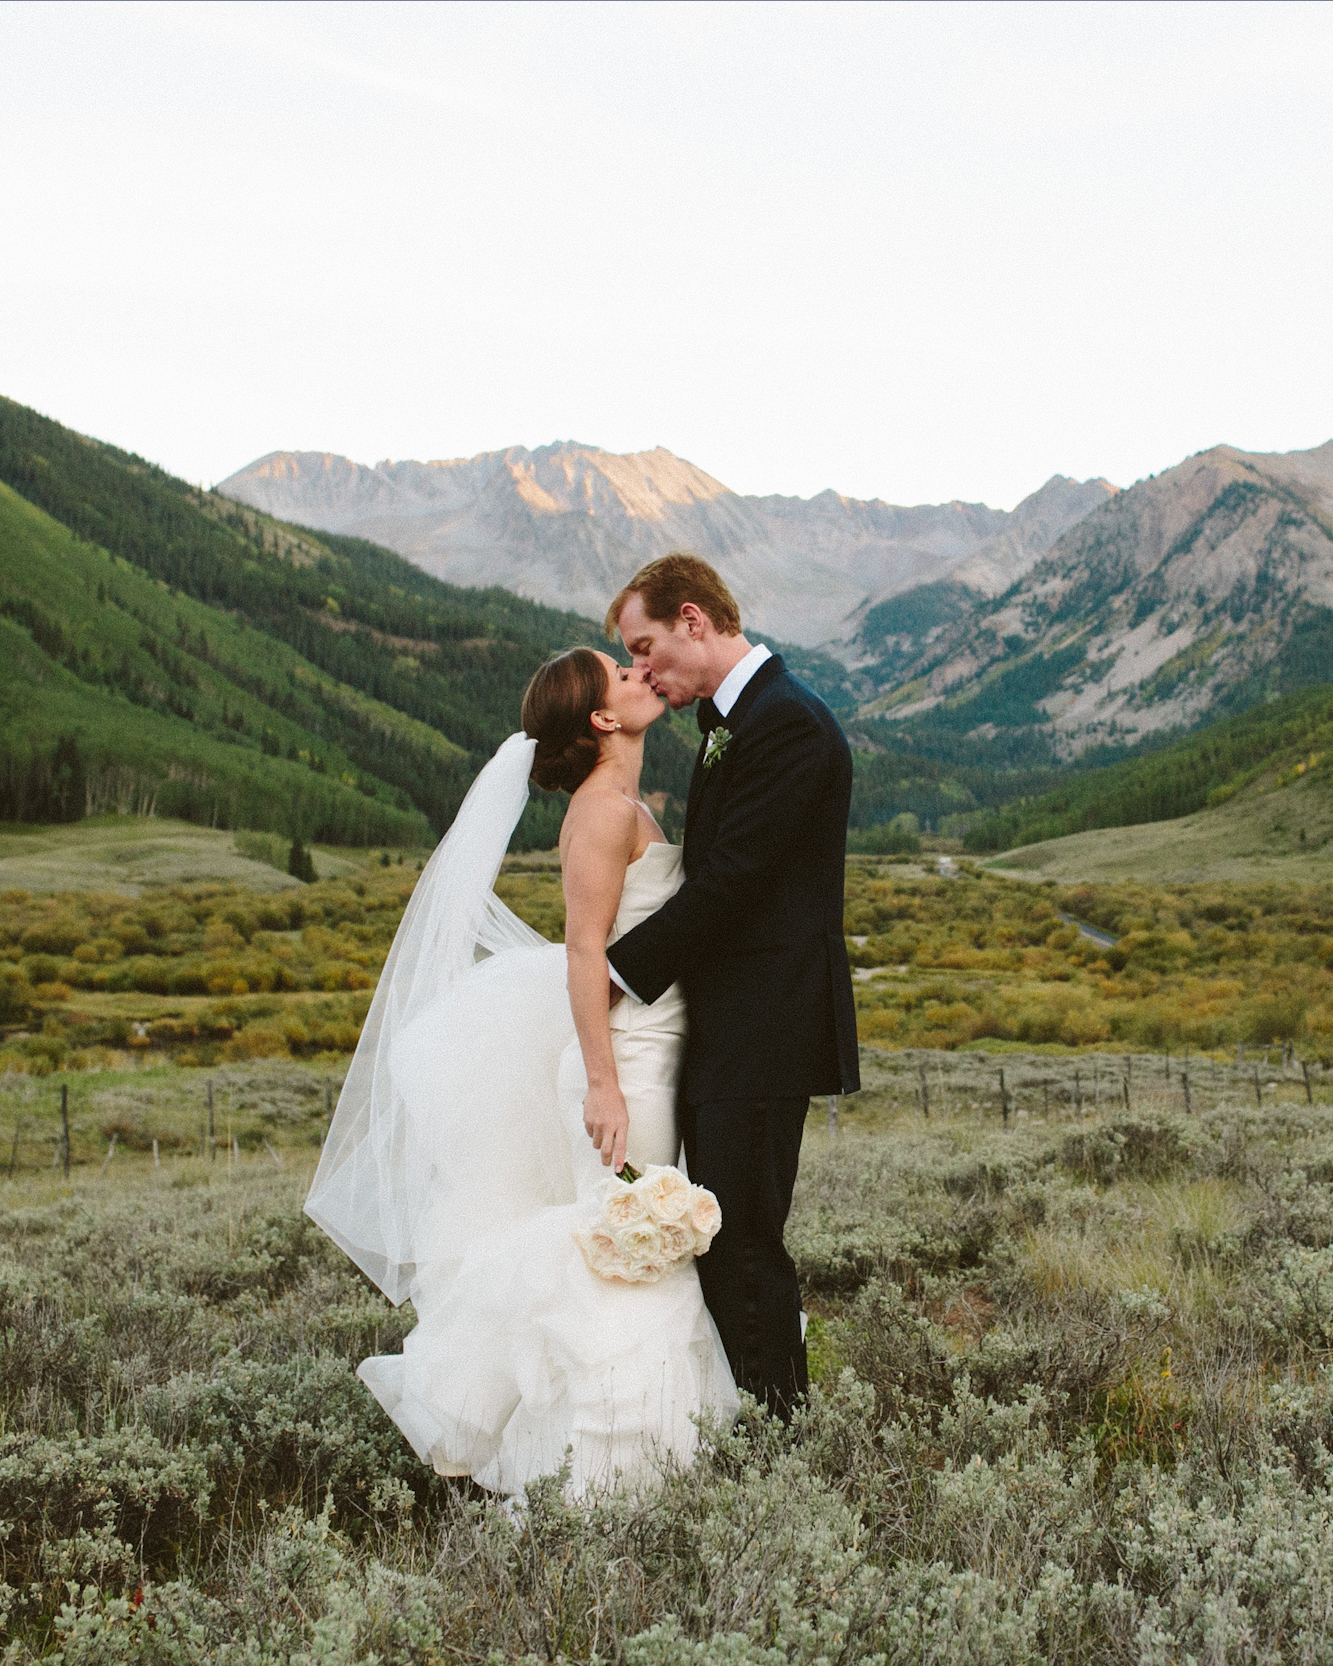 jennifer steve wedding couple kiss